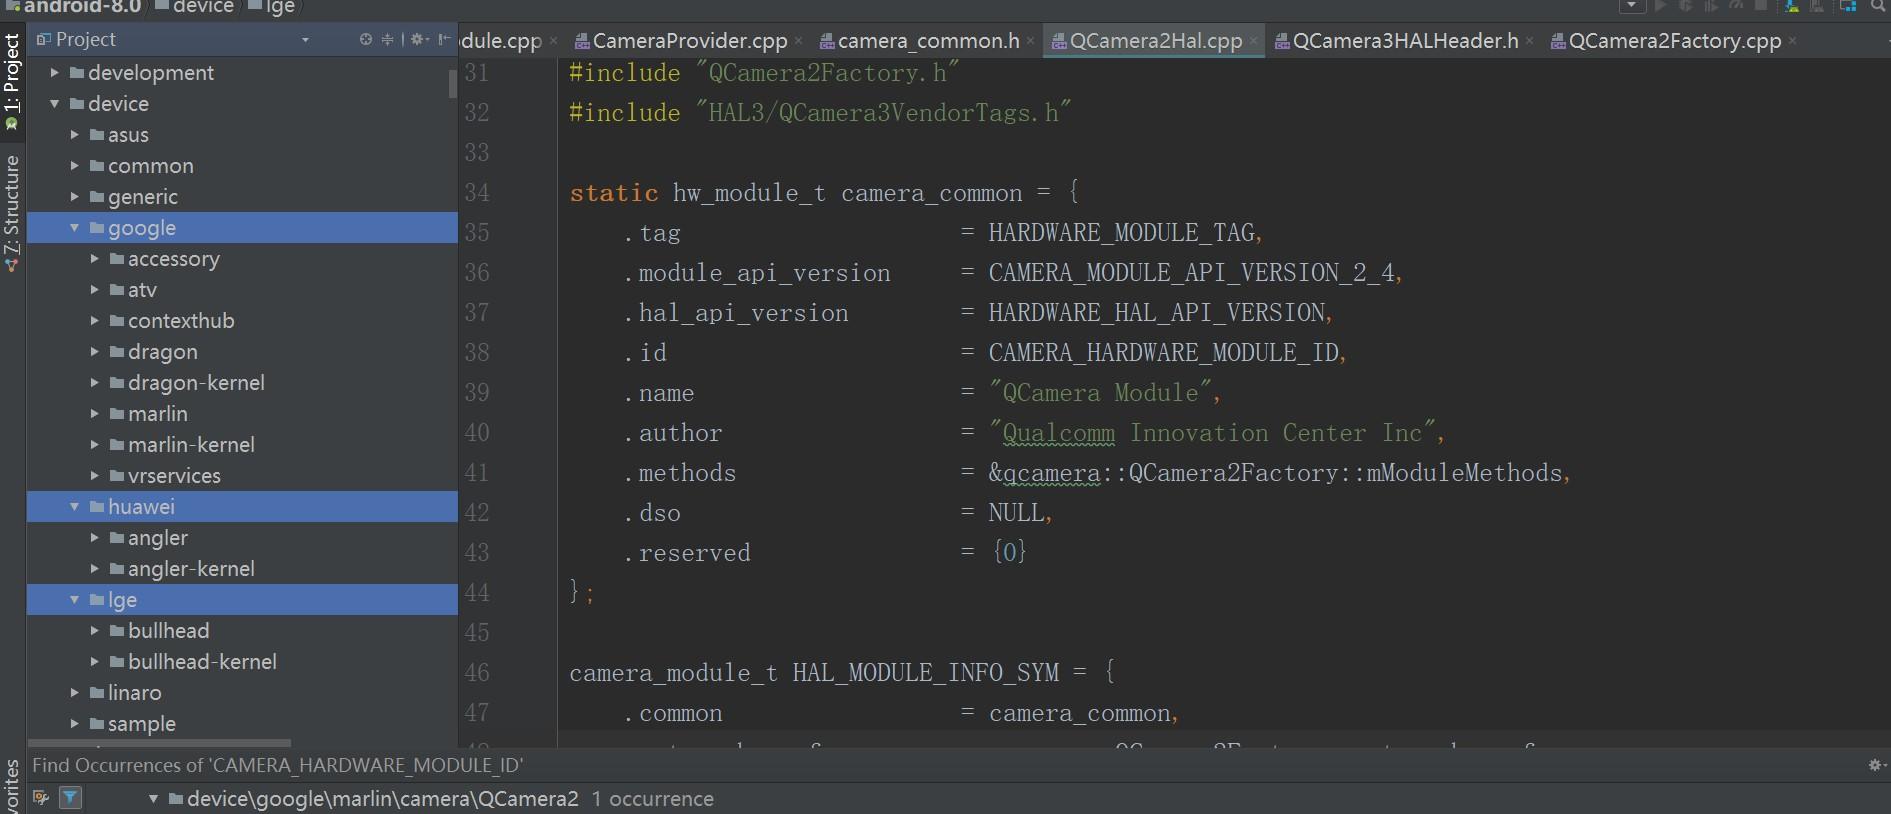 Android 8 0系统源码分析--openCamera(HAL)启动过程源码分析